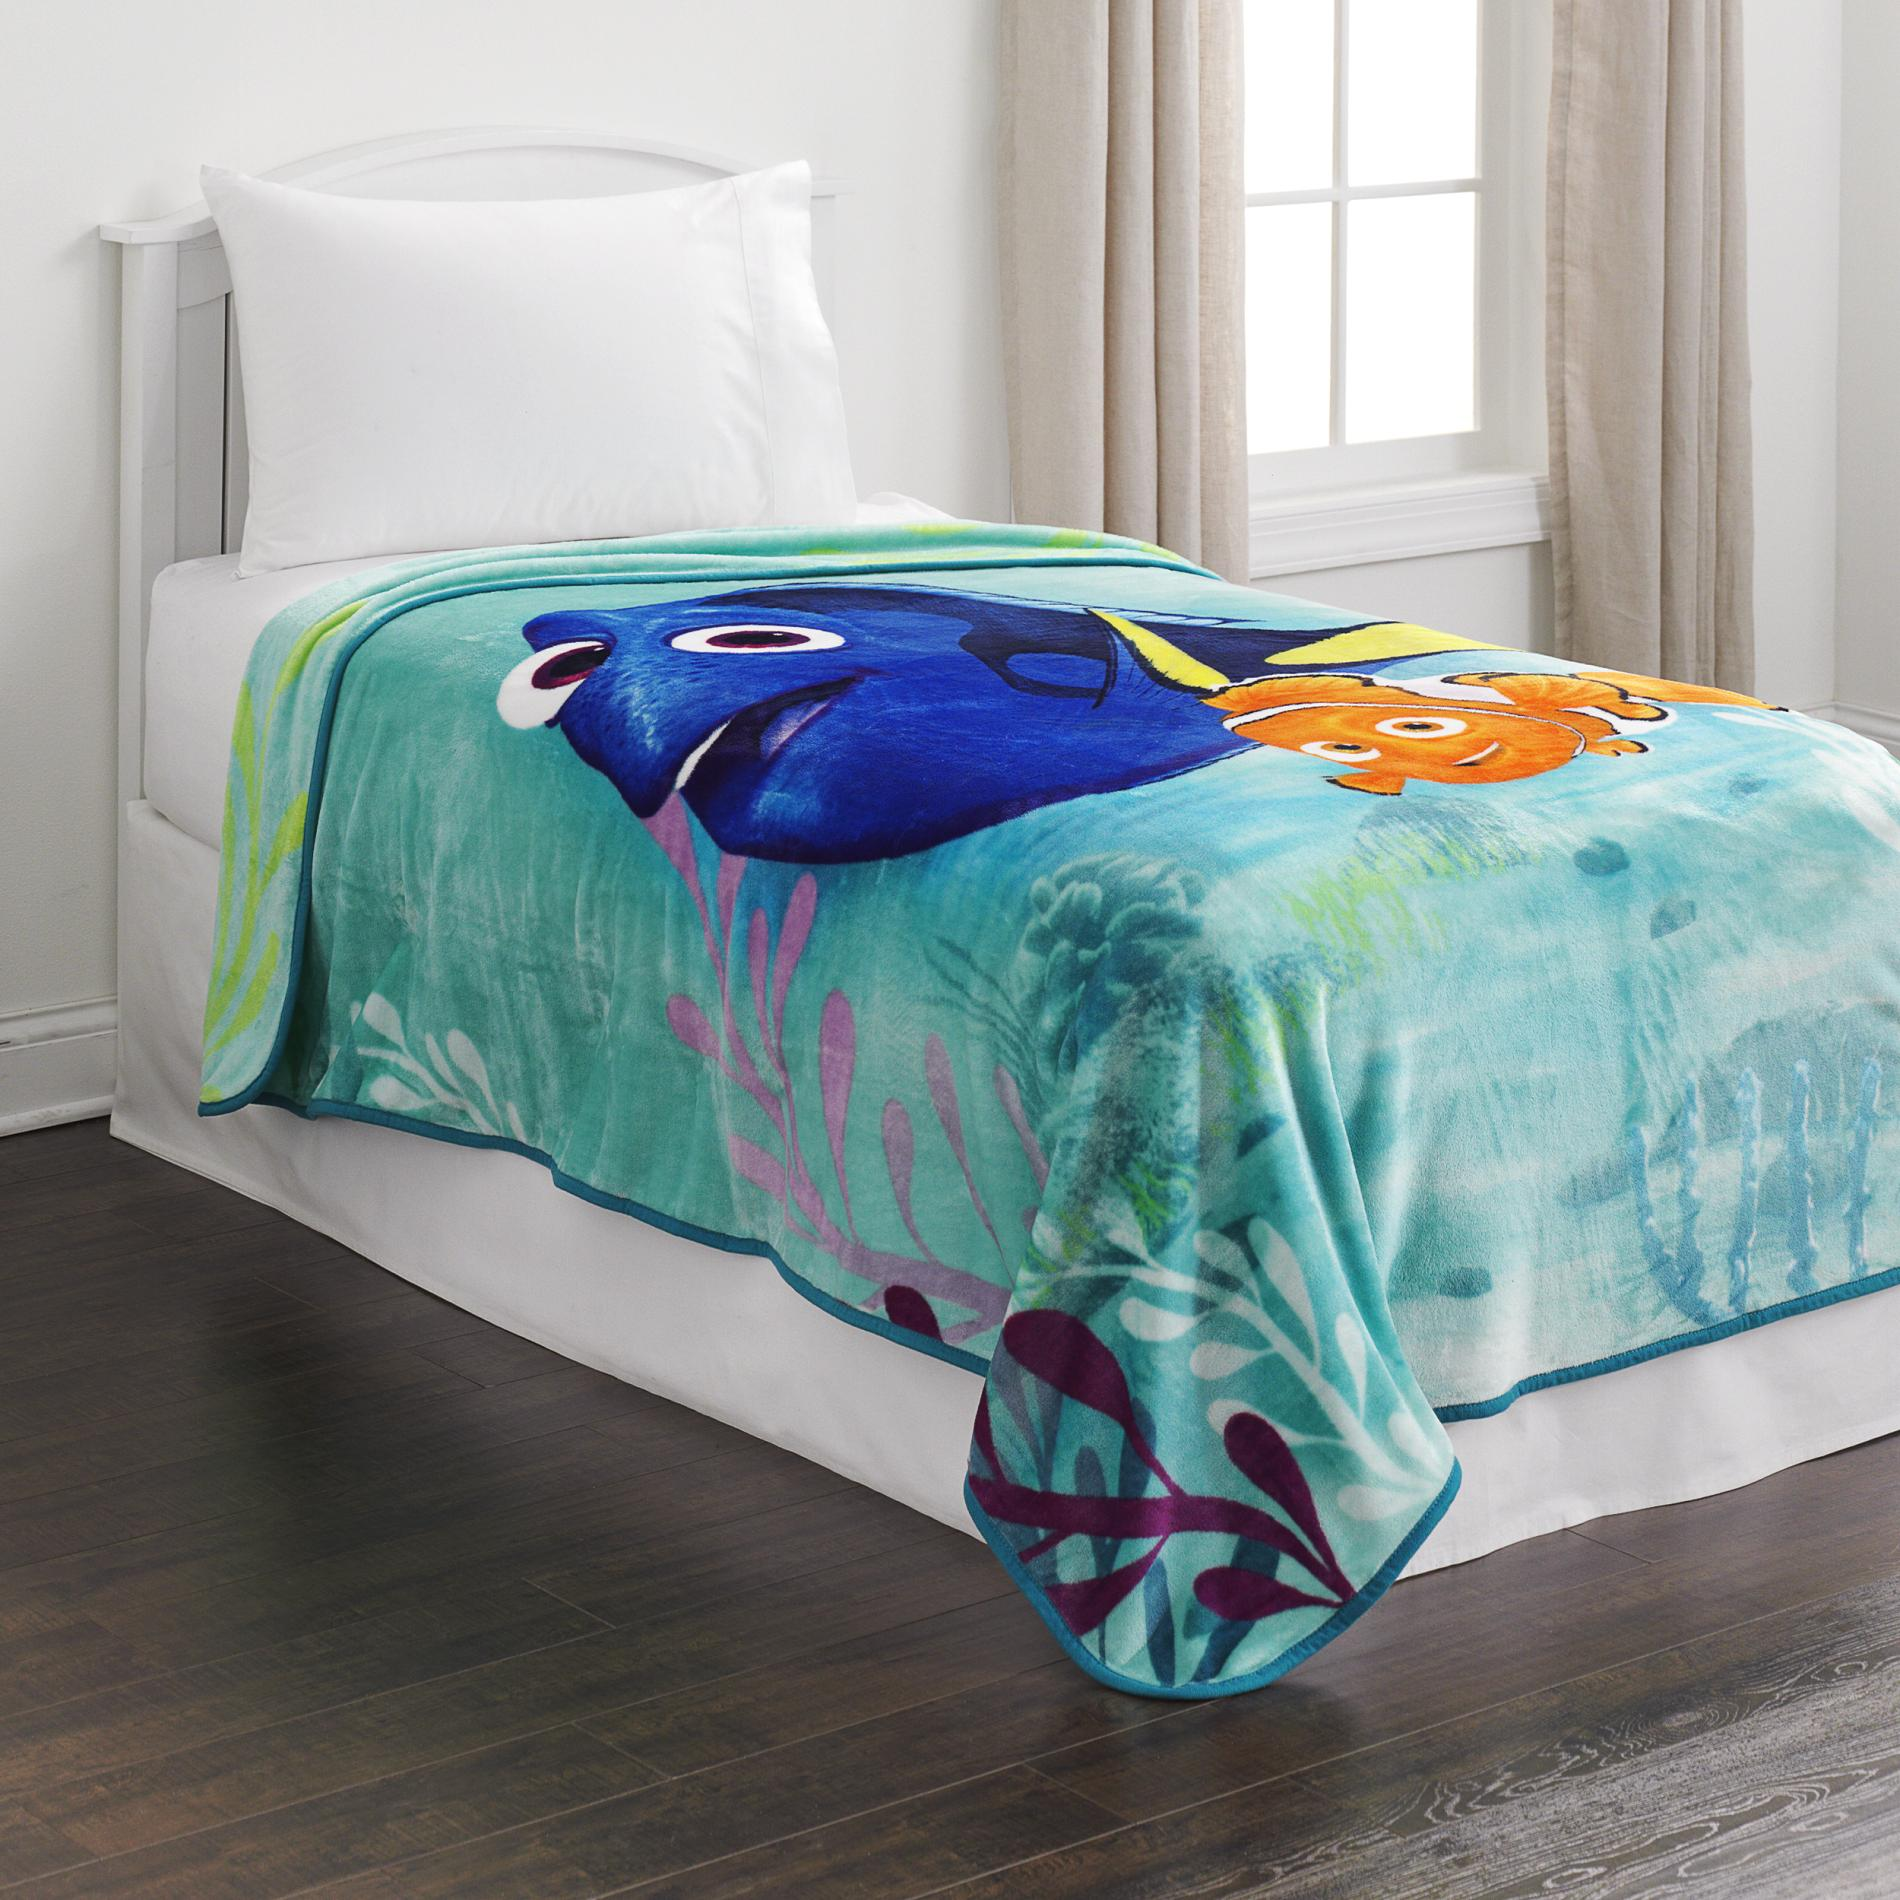 Disney Fleece Blanket - Finding Dory